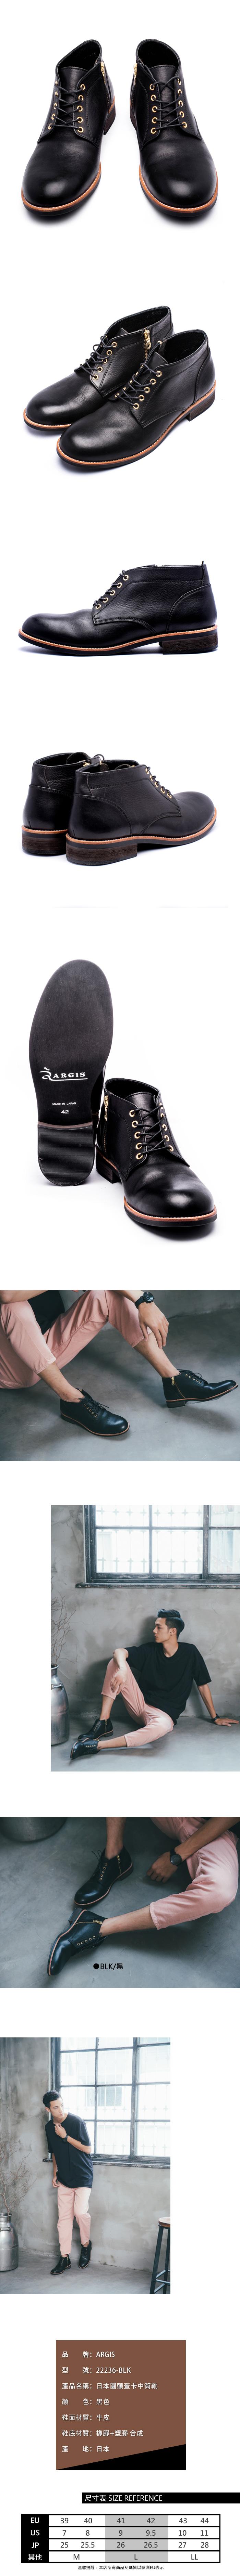 ARGIS Japanese round head Chaka boots  22236 black - Japanese ... 8c84df86417